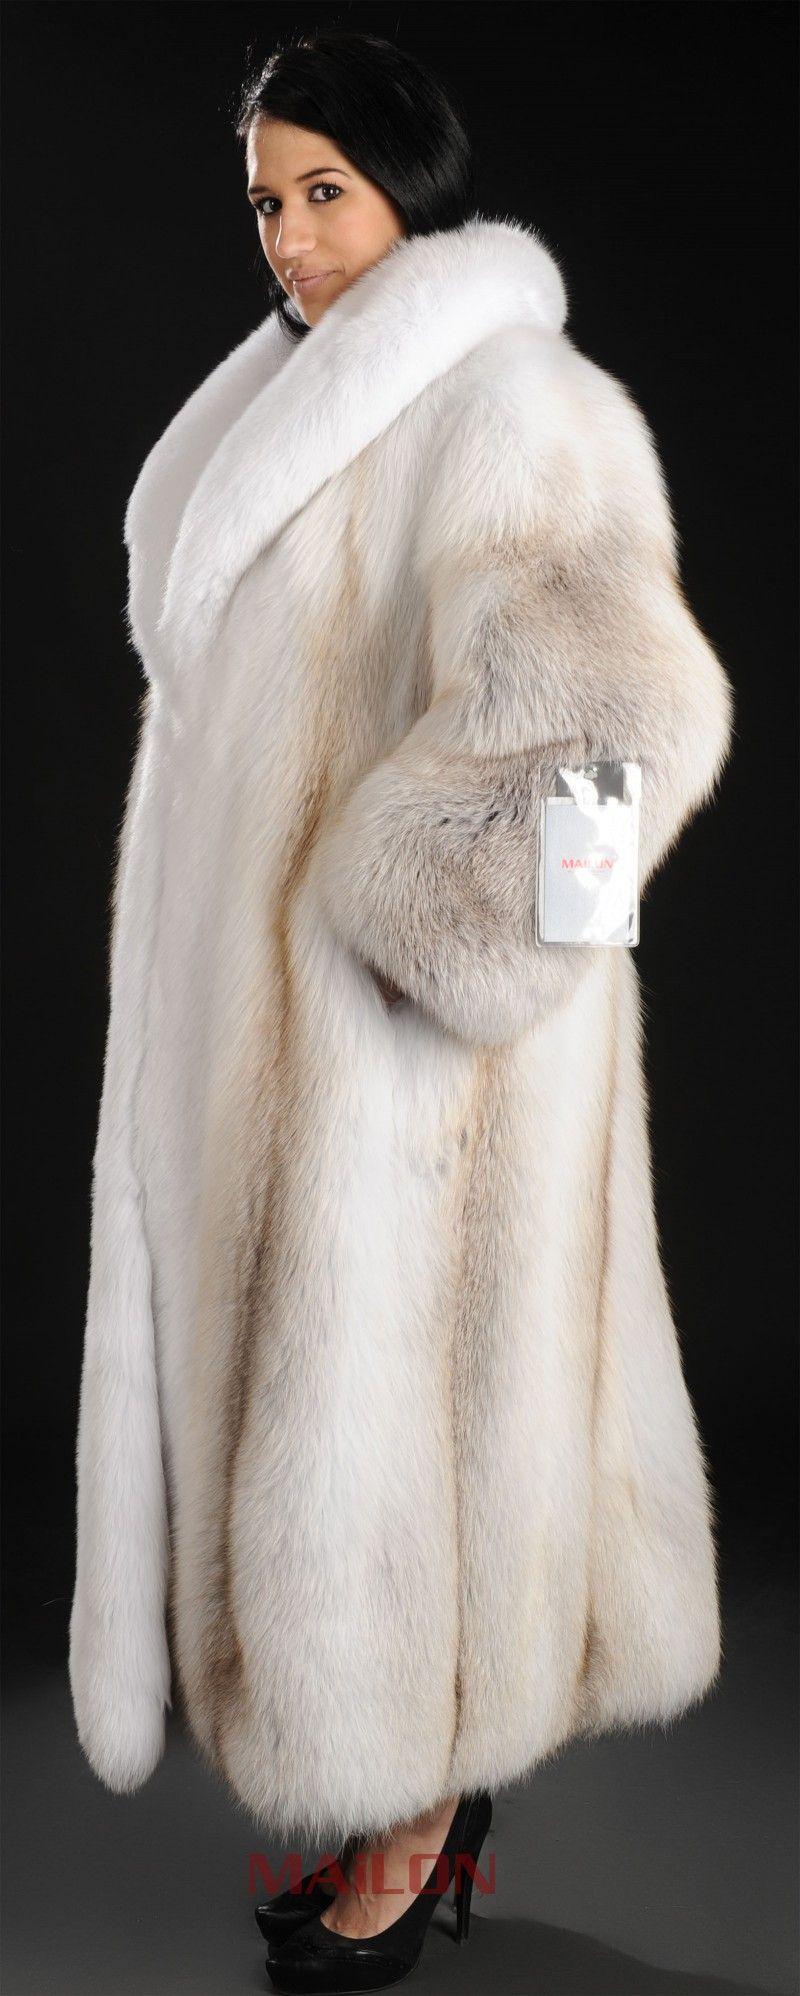 0eb08458fc27 SAGA ROYAL Golden Island Shadow Full Length Fox Fur Coat with White Fox  Collar and Tuxedo